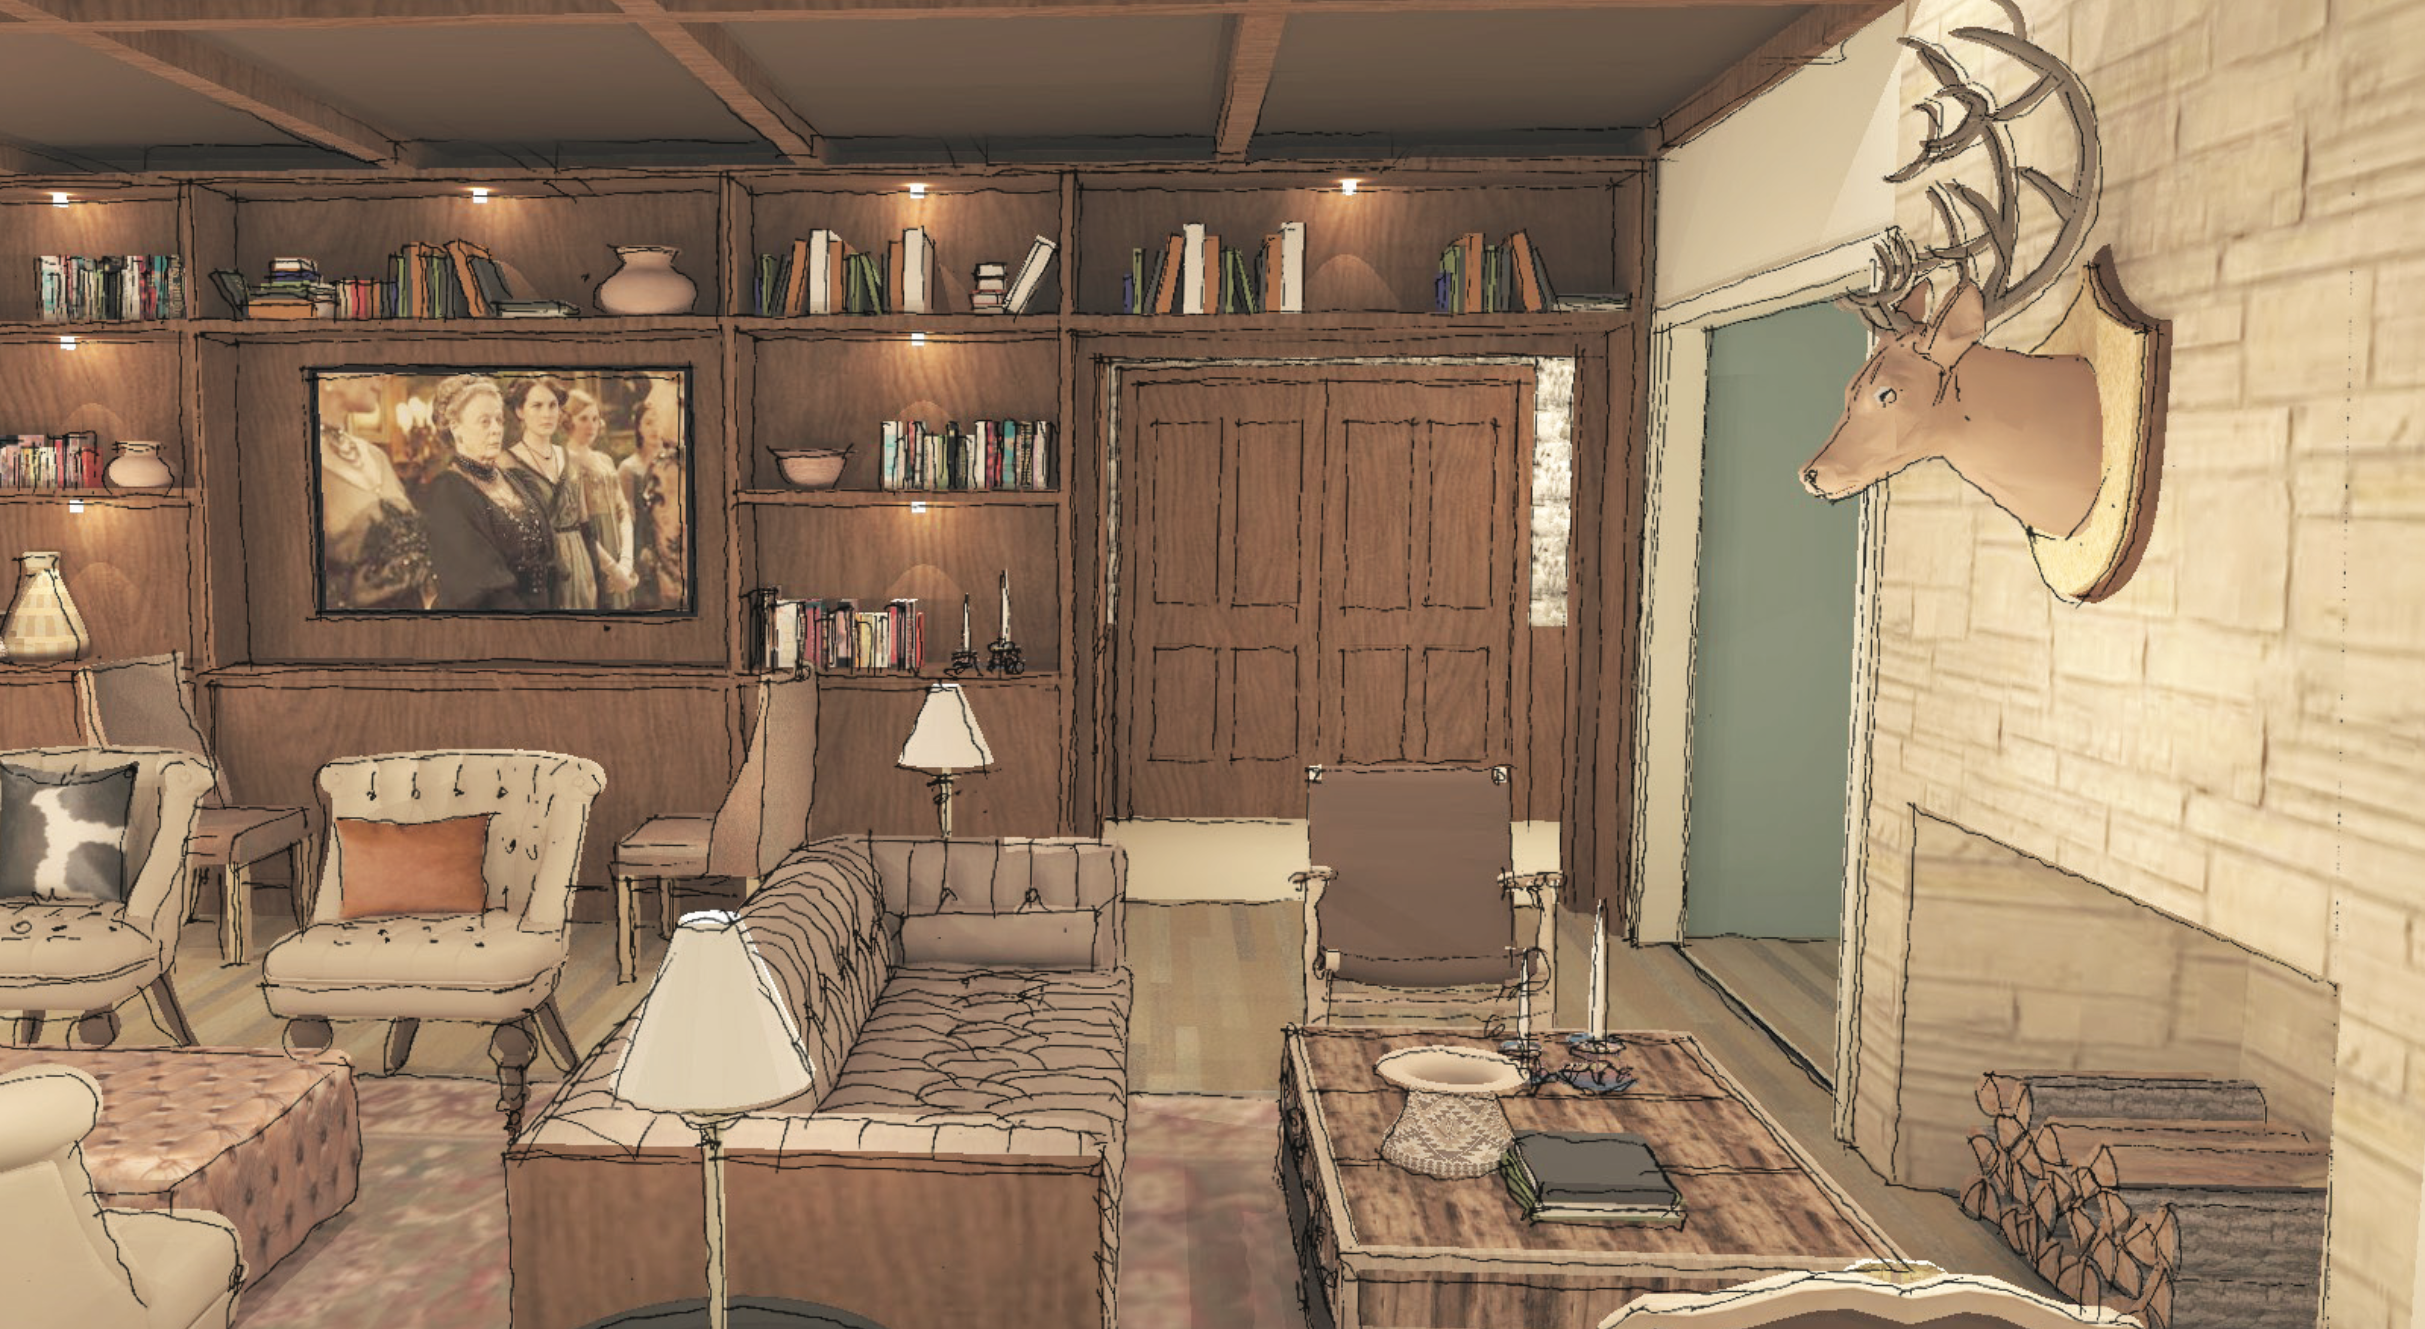 Shady Villa Bar Concept